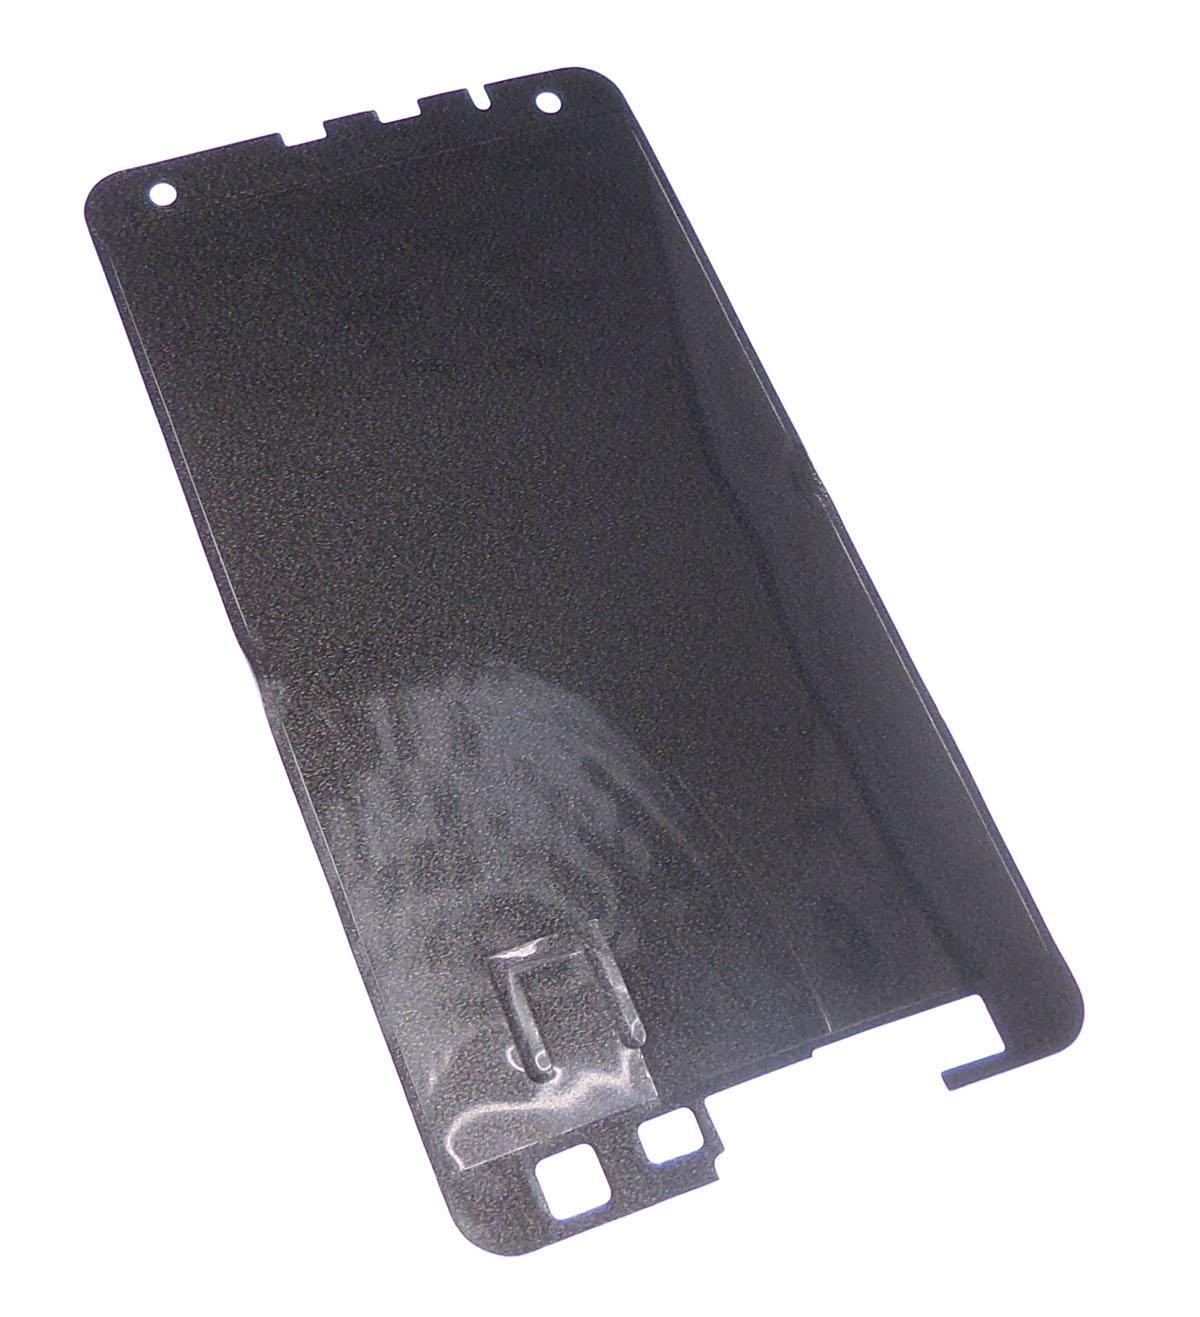 Adhésif pour tactile Nokia Lumia 625